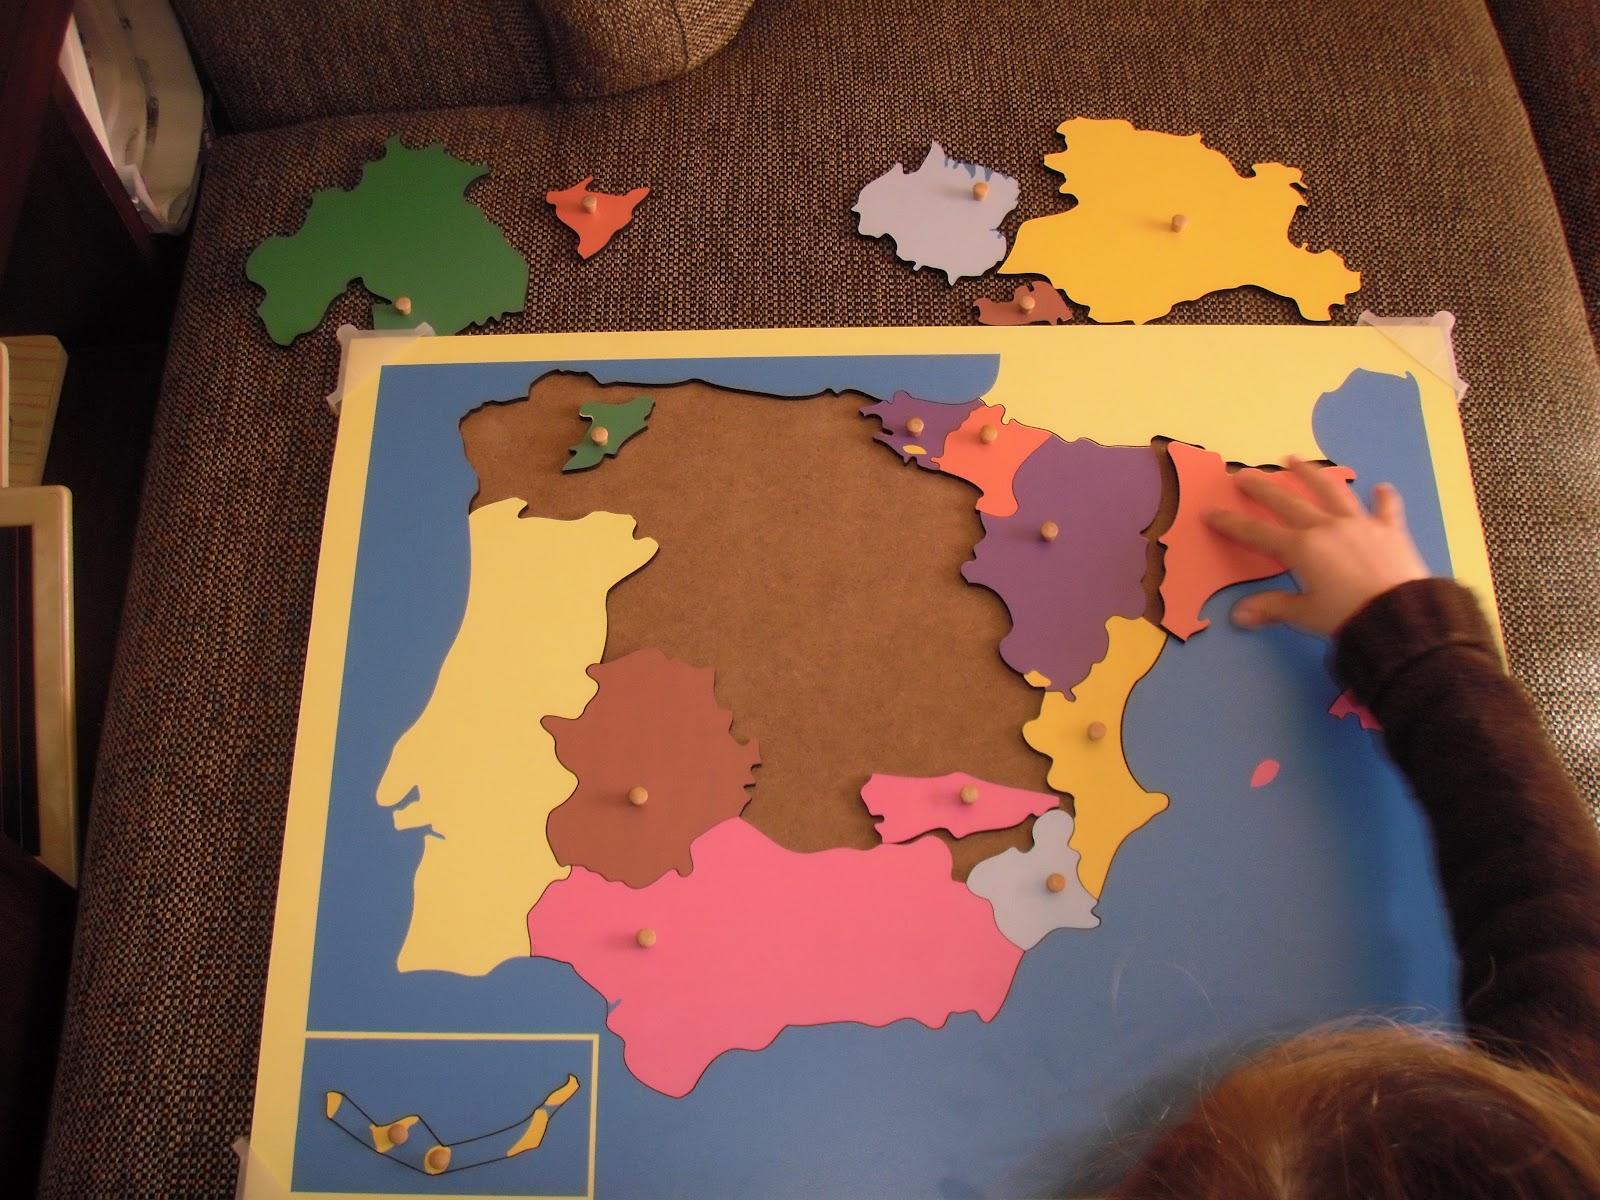 Mapa de espa a por comunidades aut nomas montessori mar del sur - La casa del puzzle madrid ...